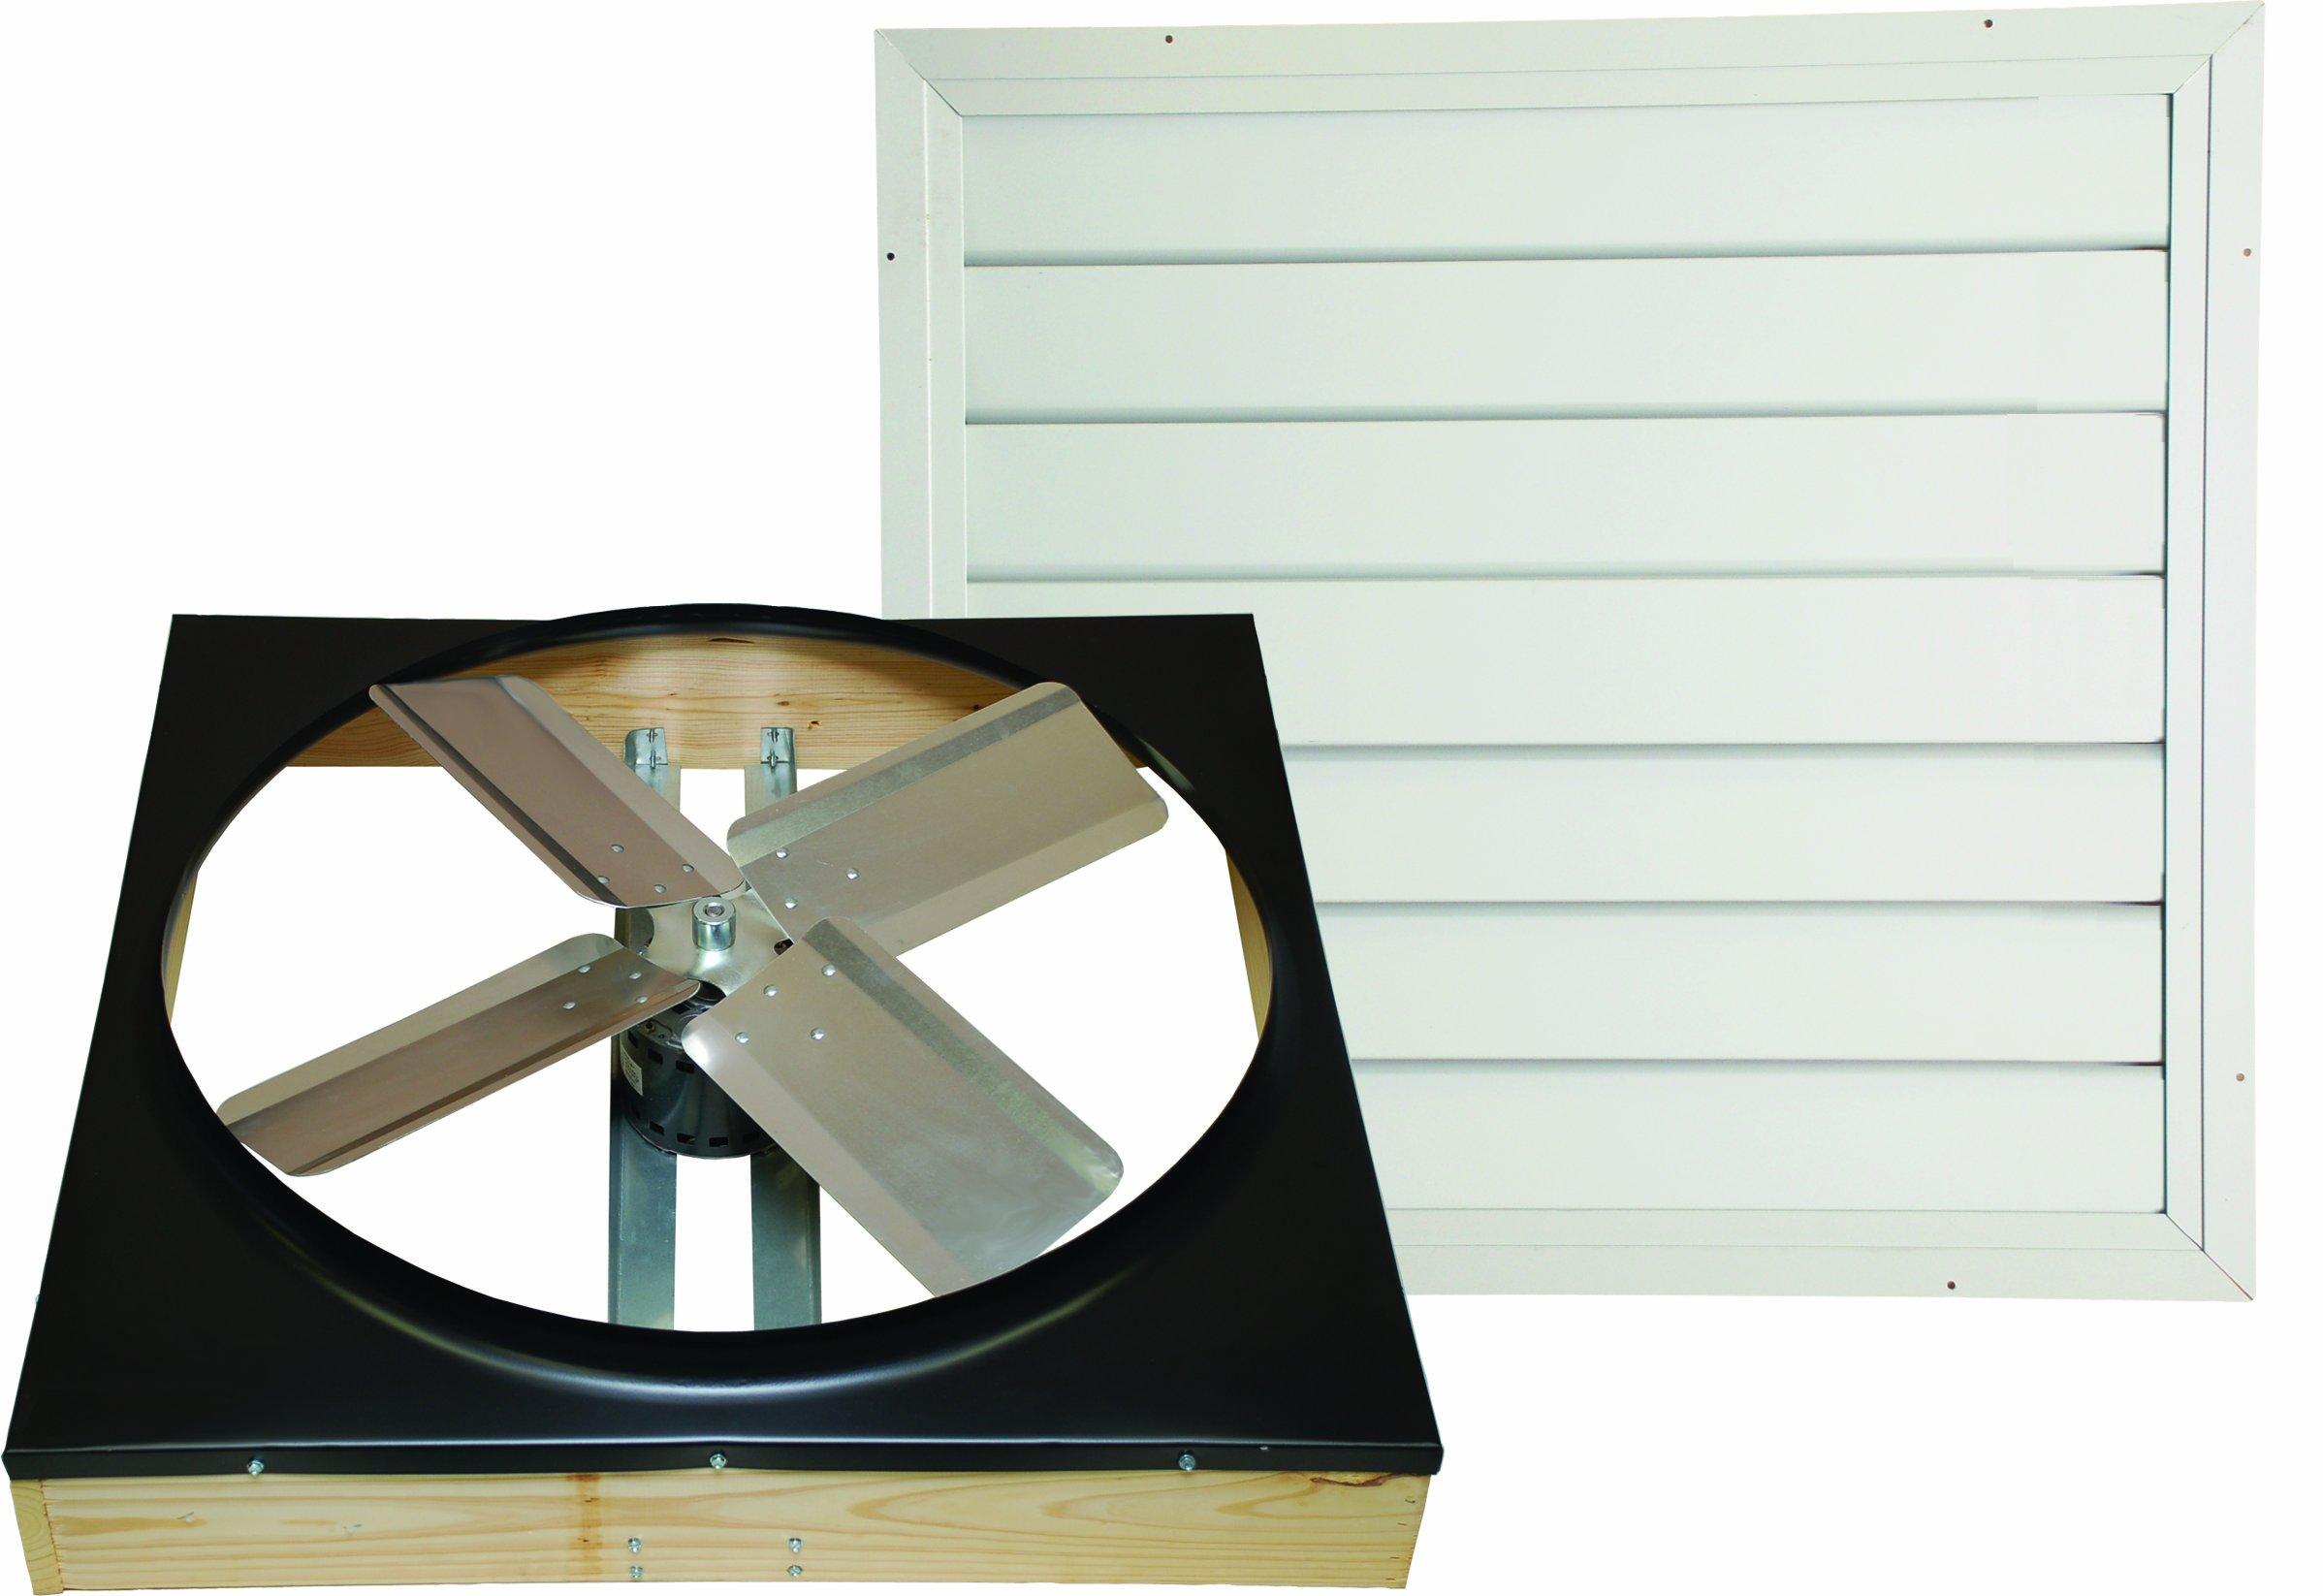 Cool Attic CX242DDWT Drive Drive 2-Speed Whole House Fan with Shutter, Exhaust Fan, 24-Inch